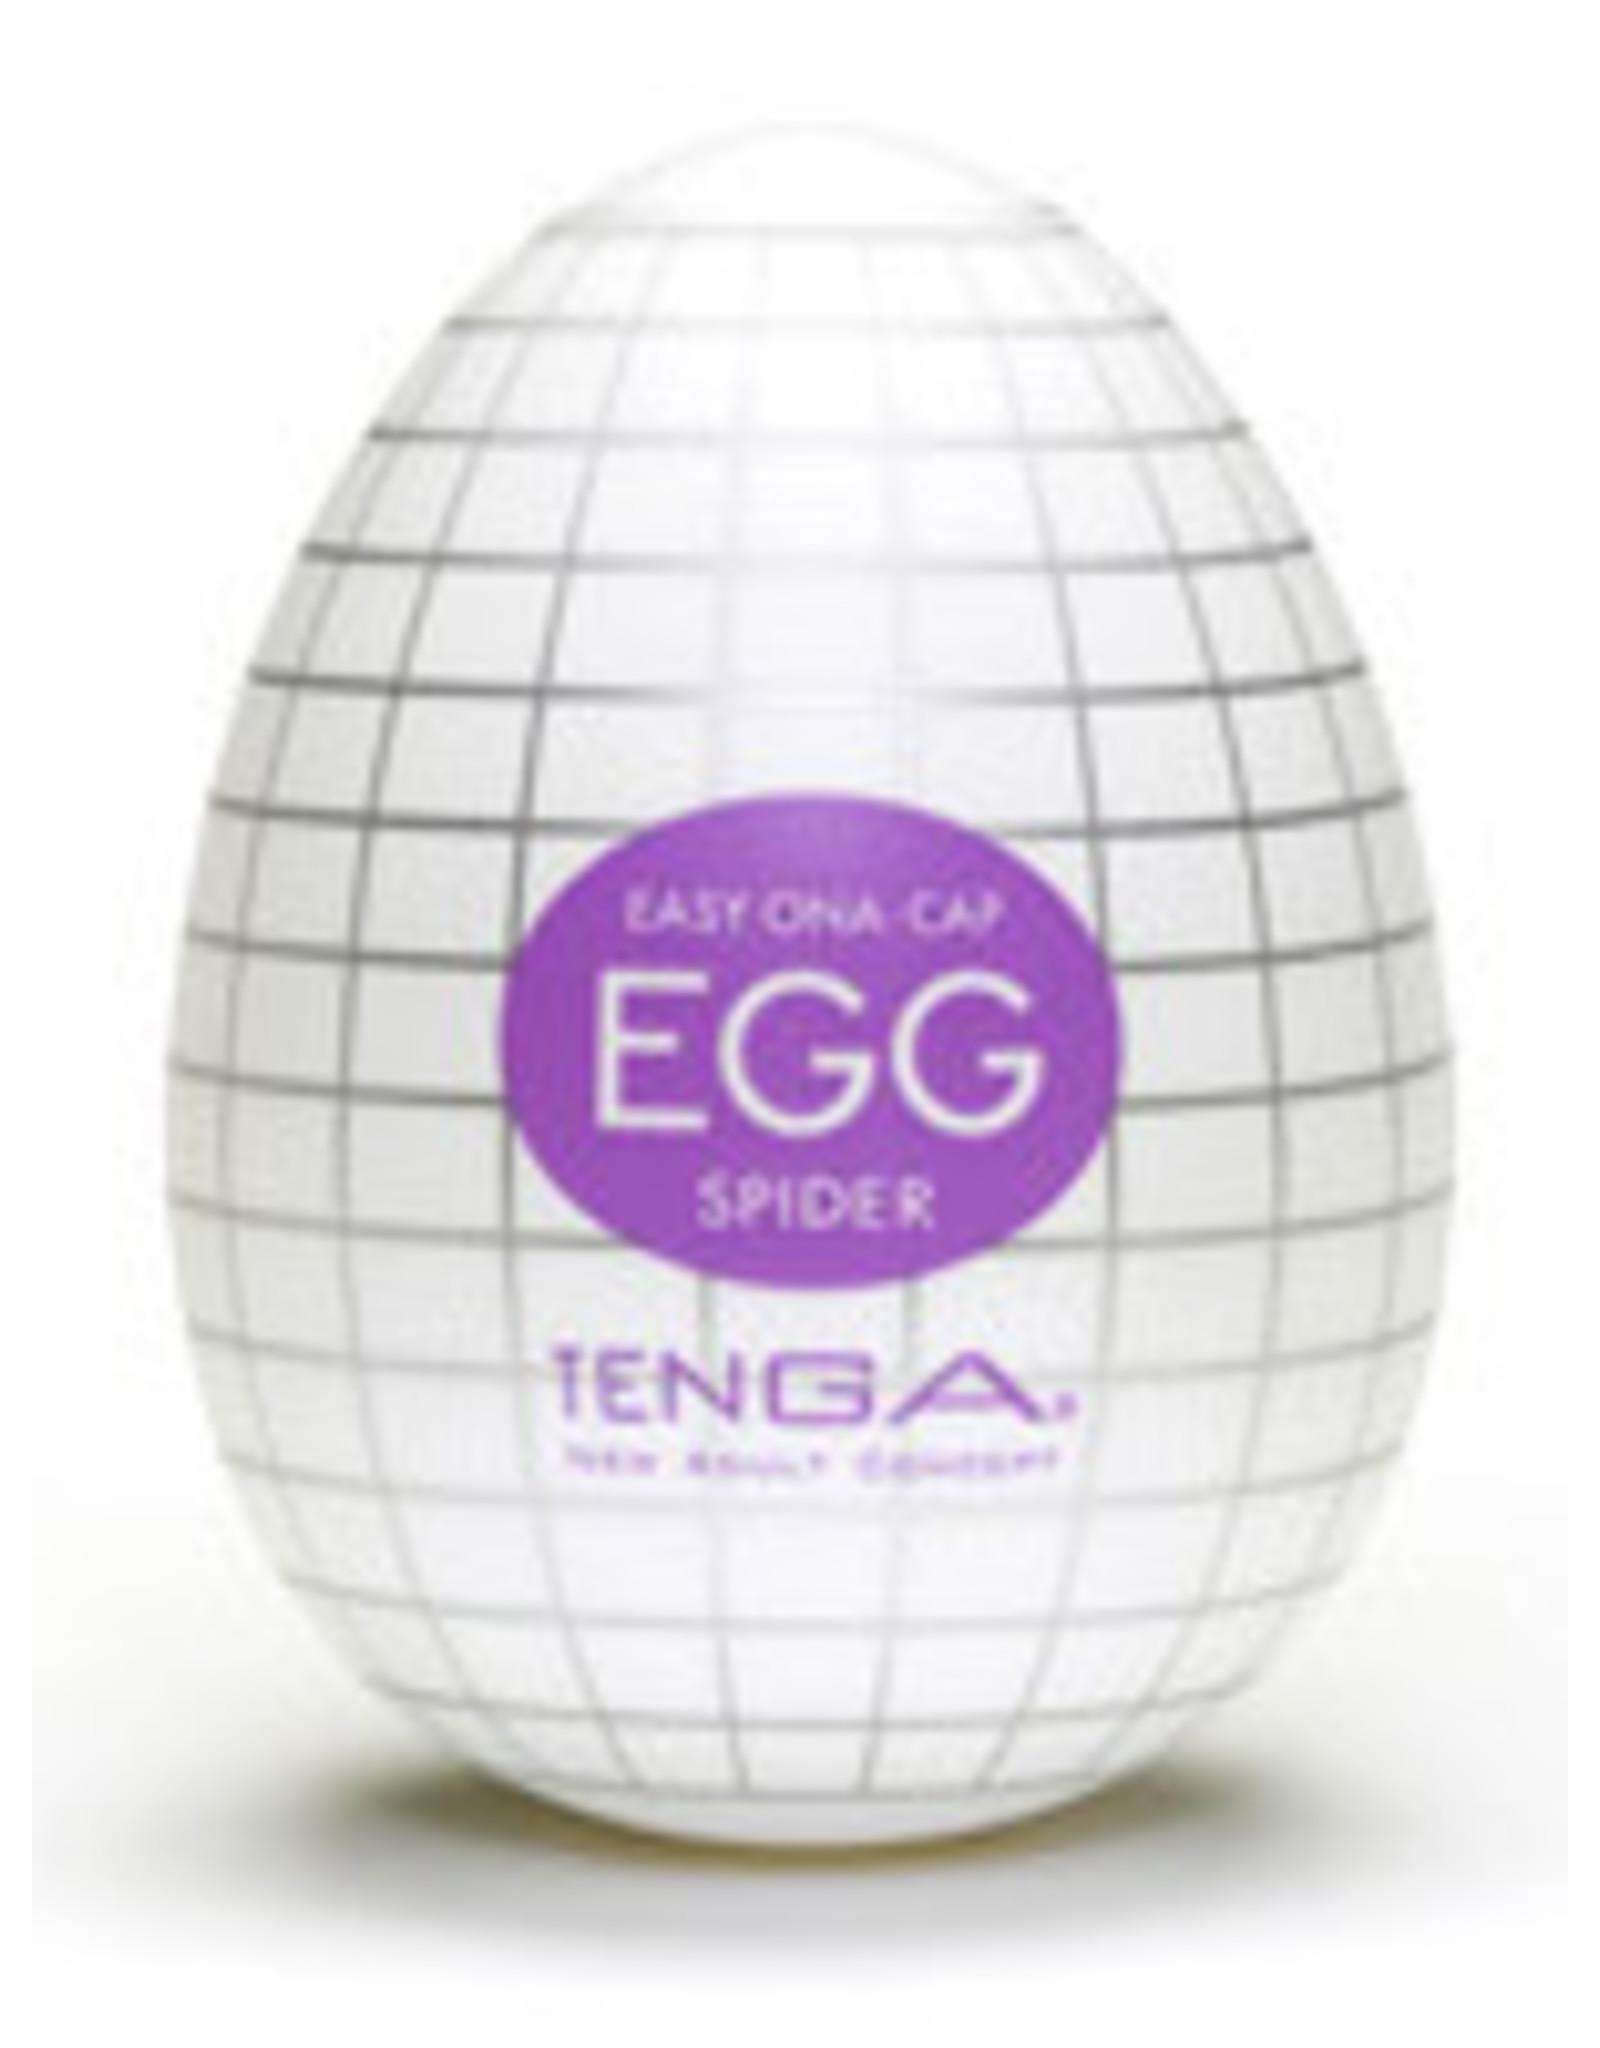 Tenga Tenga - Egg Spider